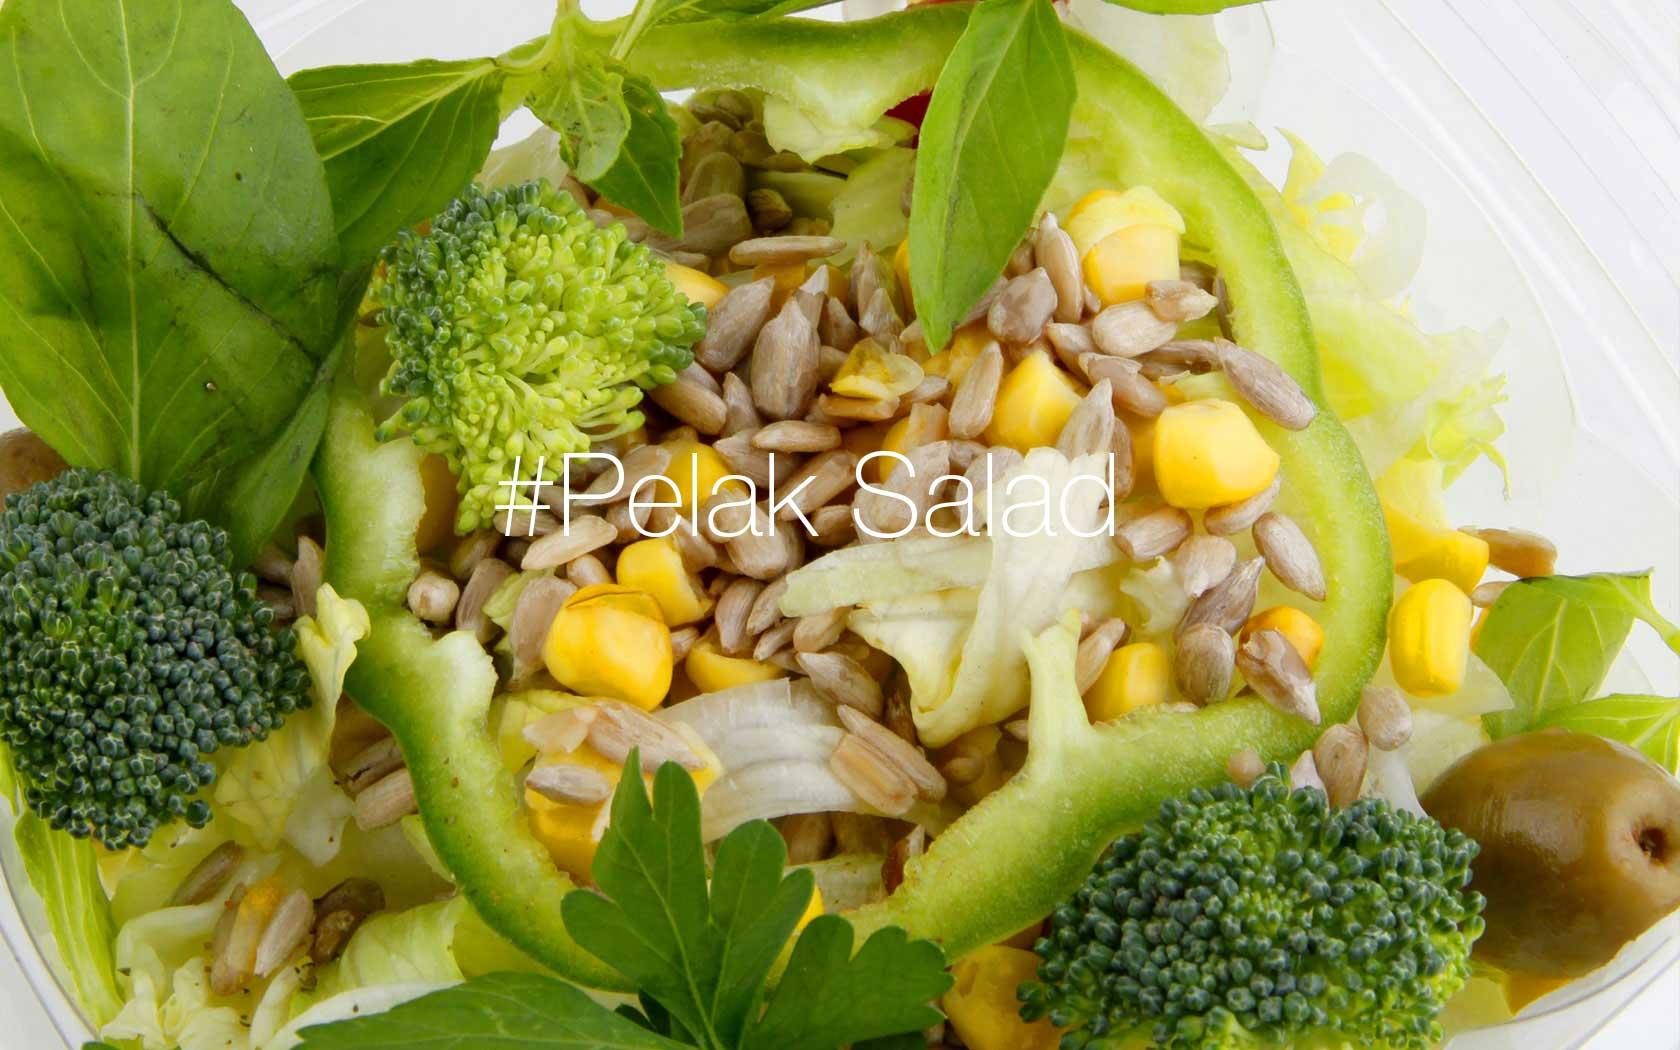 Pelak salad